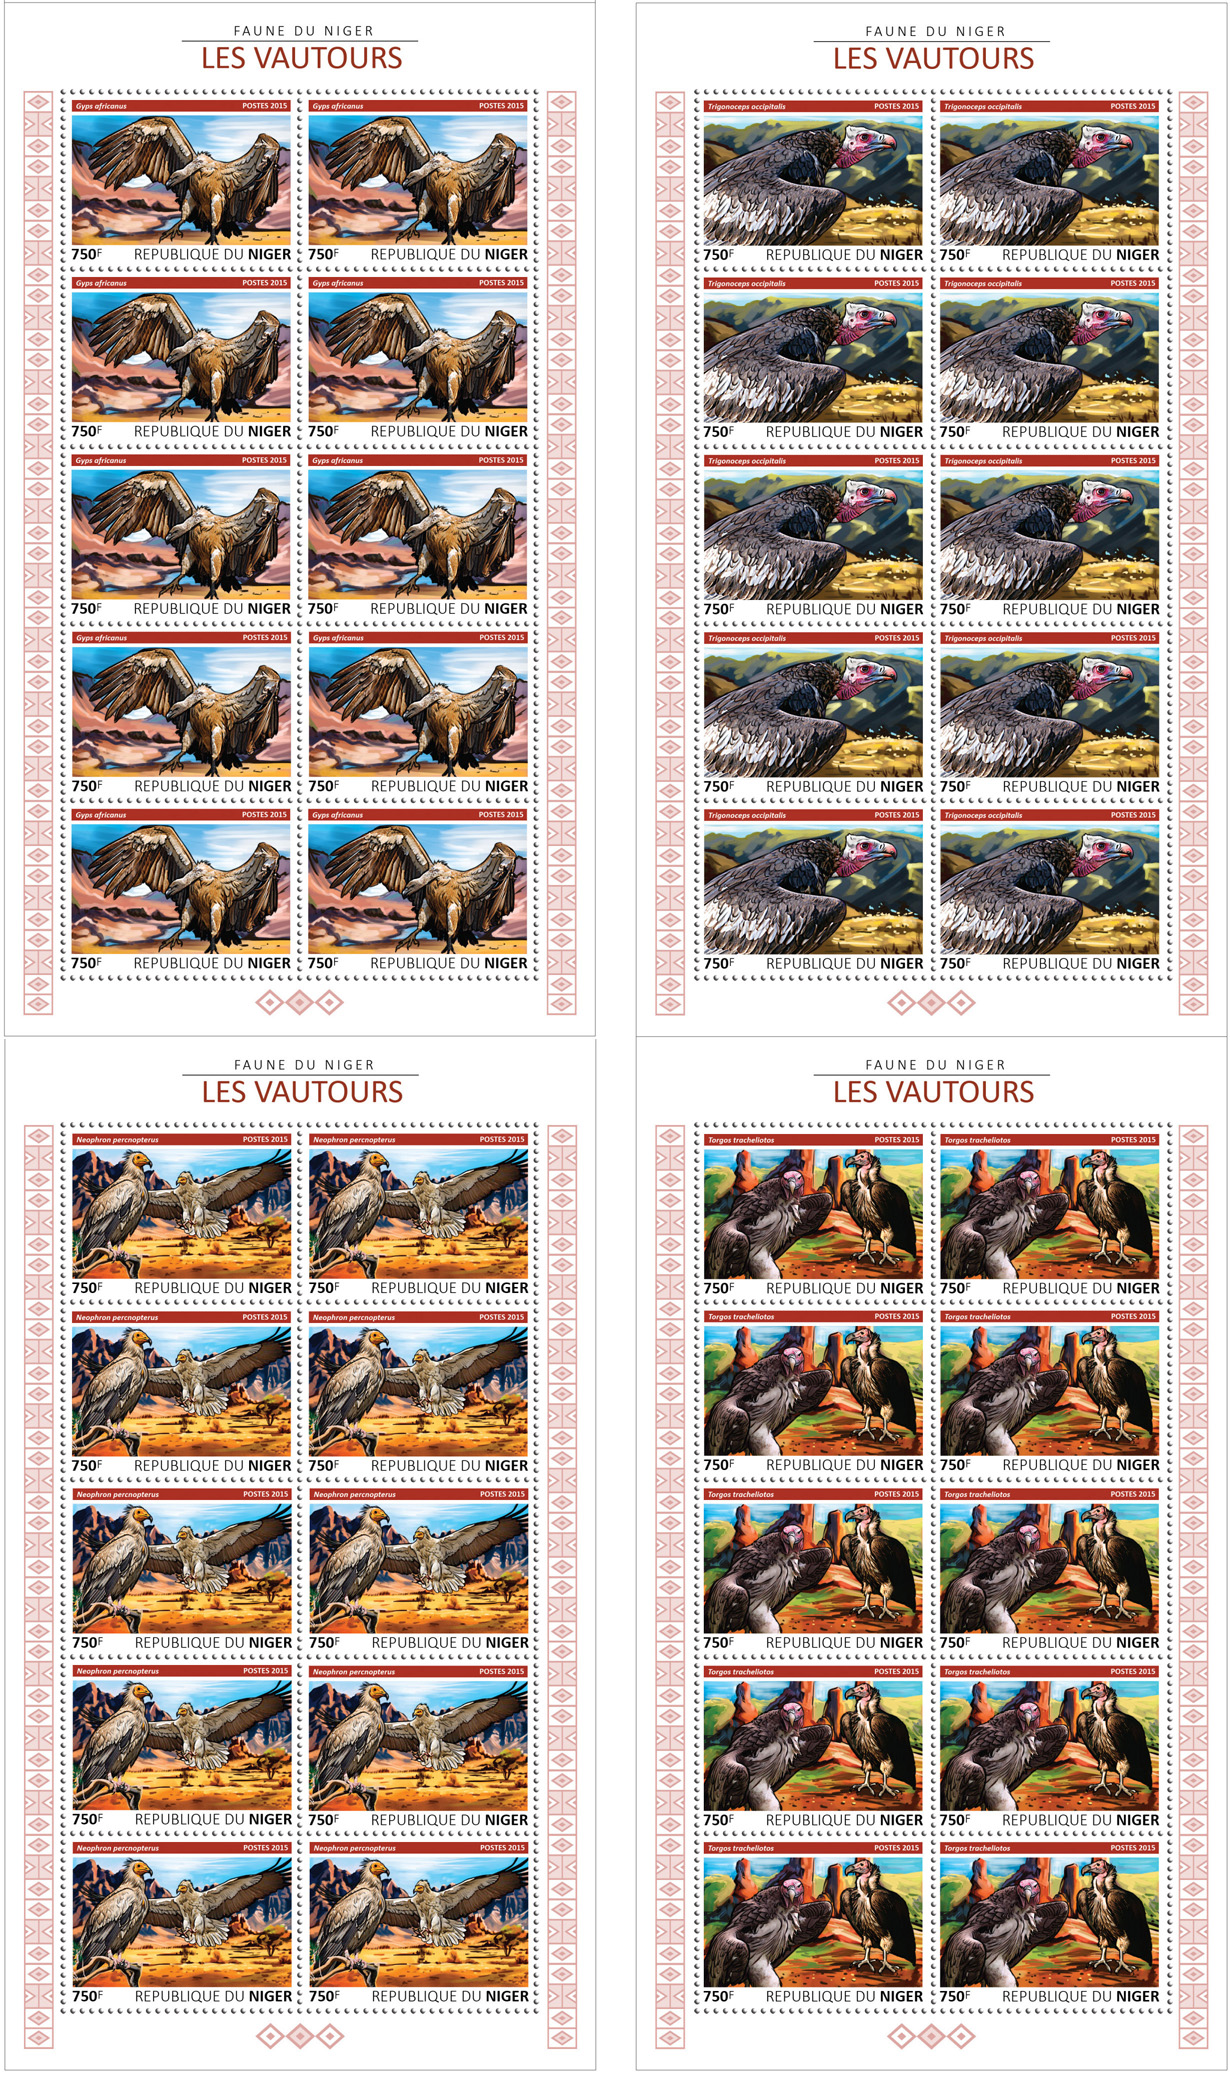 Vultures 4x10v - Issue of Niger postage stamps